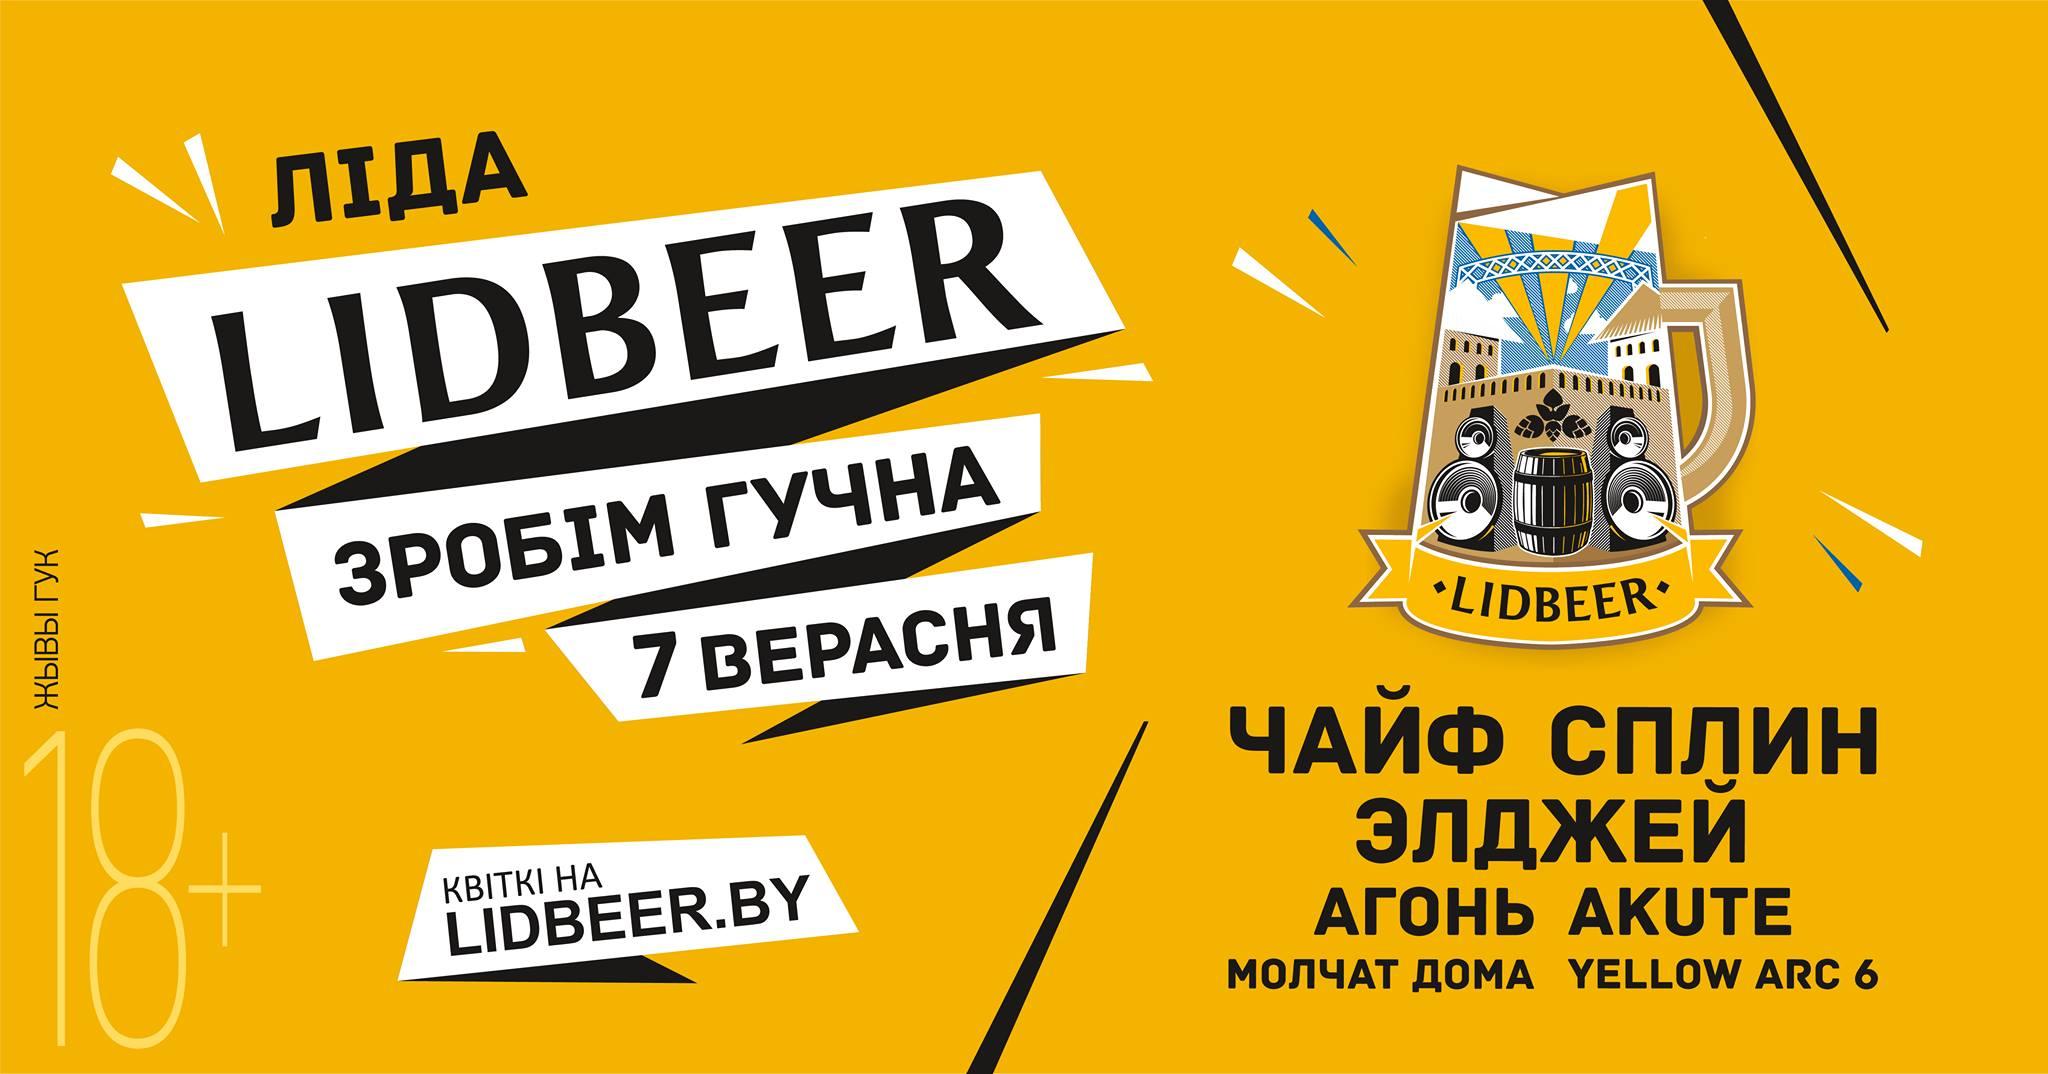 Юбілейны Lidbeer-2019